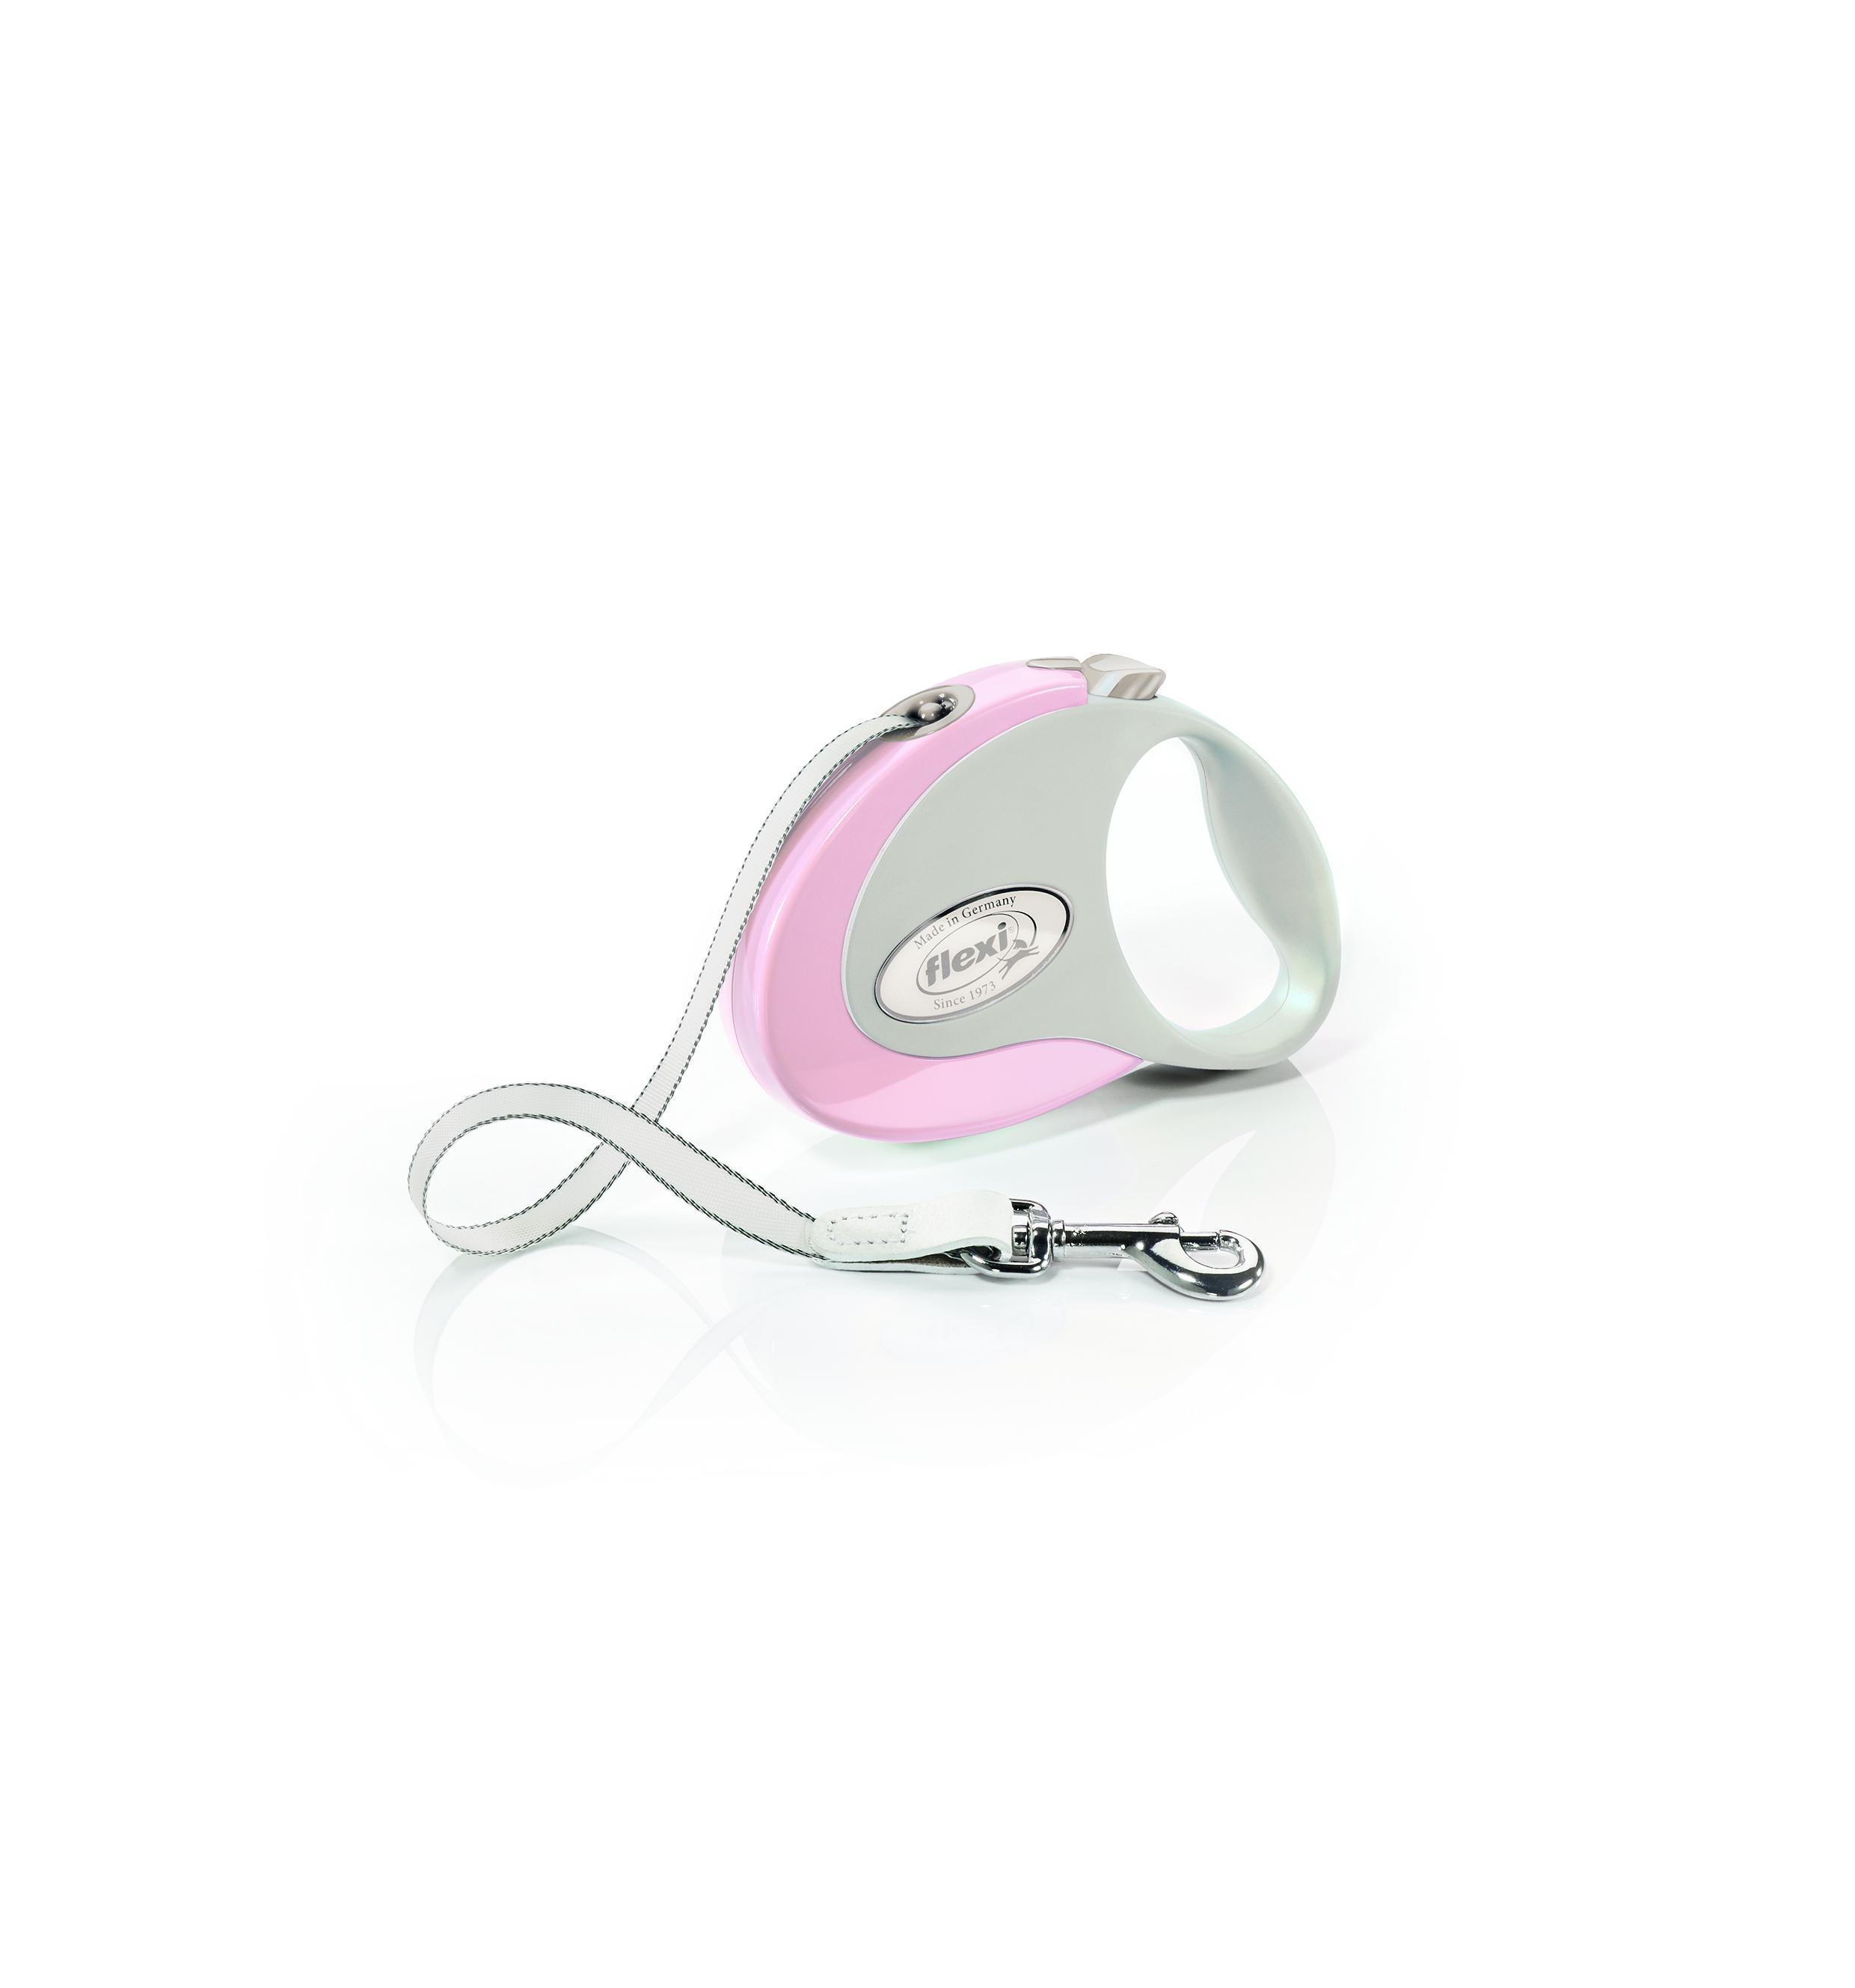 Flexi New Style Tape Dog Leash, Rose/Gray Image